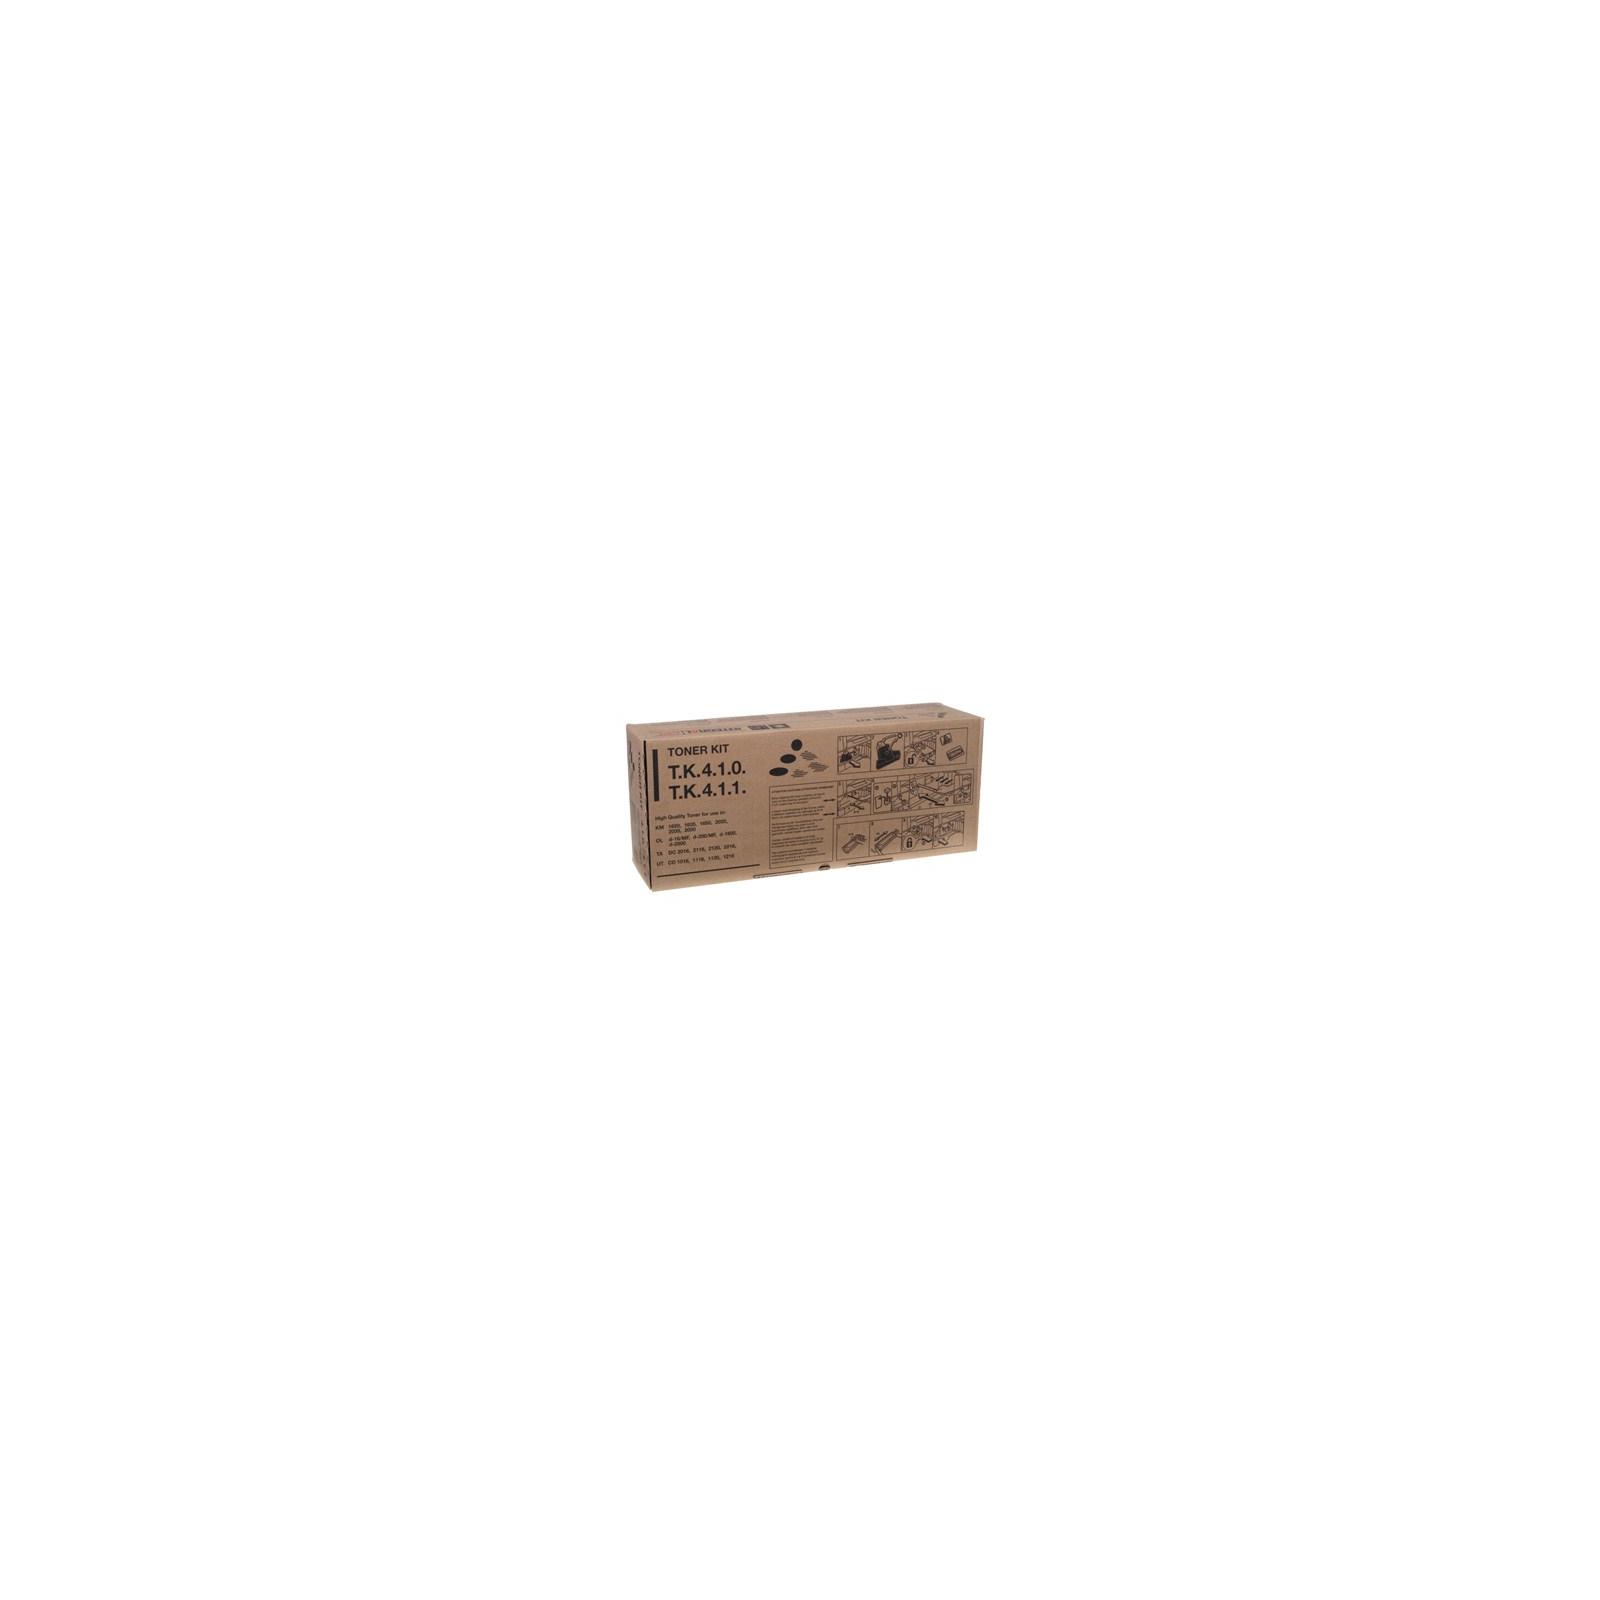 Тонер Kyocera TK-410 (туба 870г) Integral (12100017)